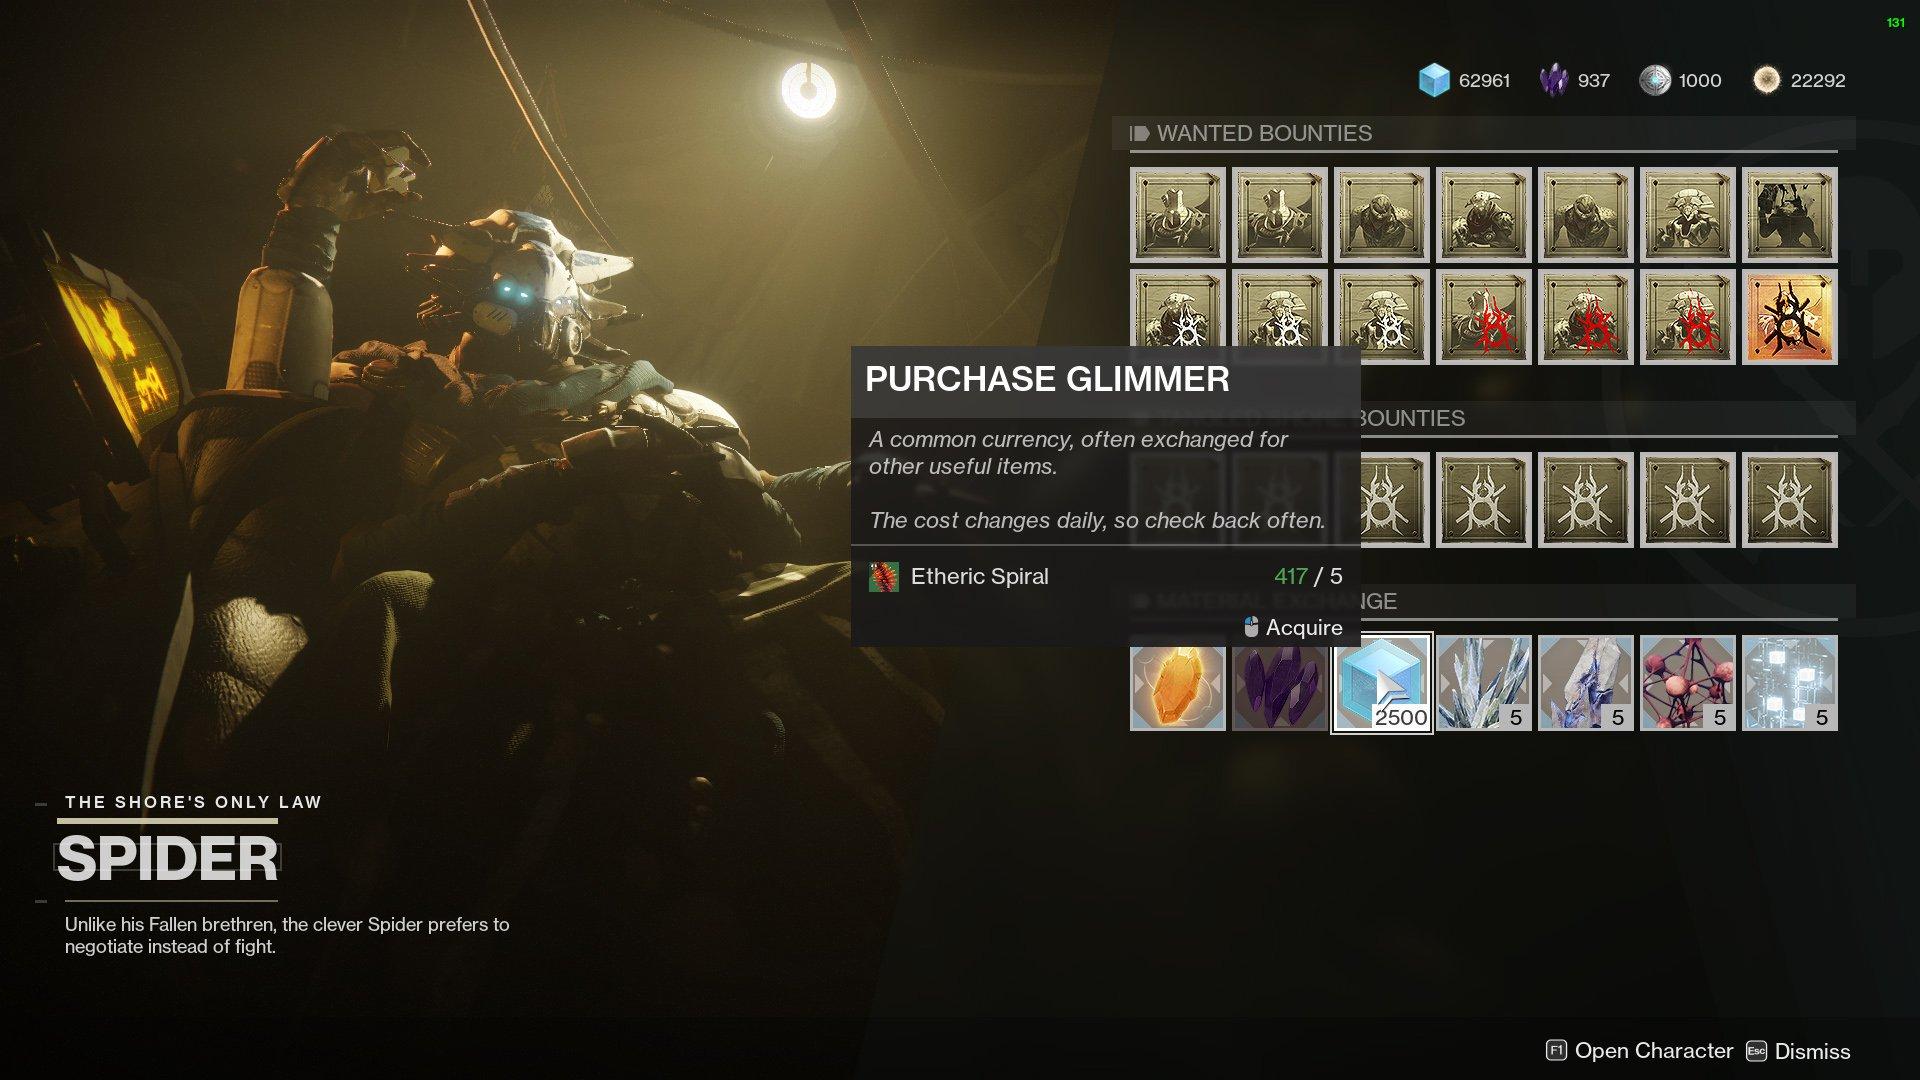 Spider Glimmer Destiny 2